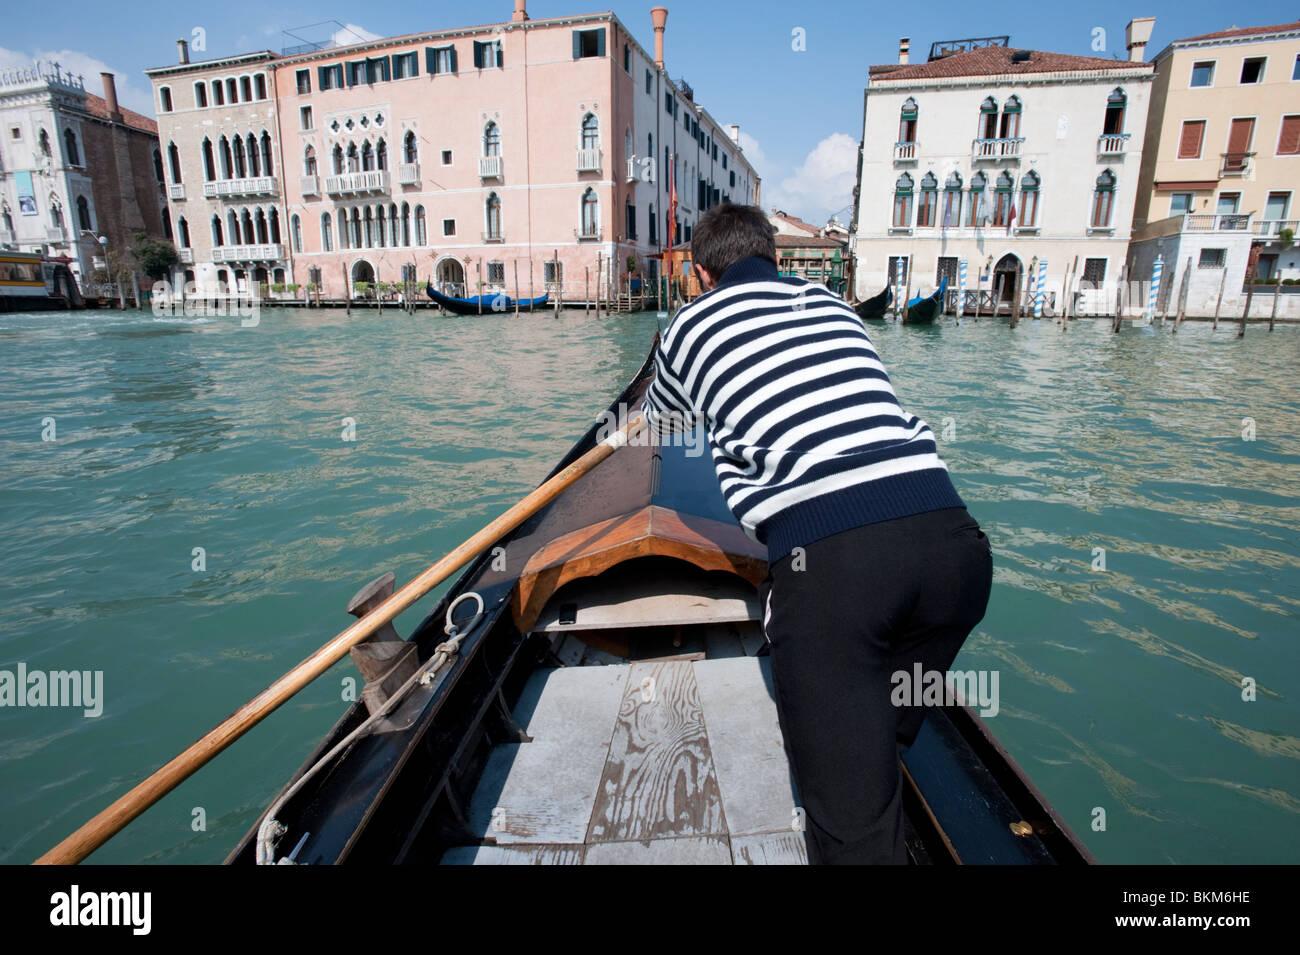 Gondolier of public ferry Traghetto gondola crossing the Grand Canal in Venice - Stock Image